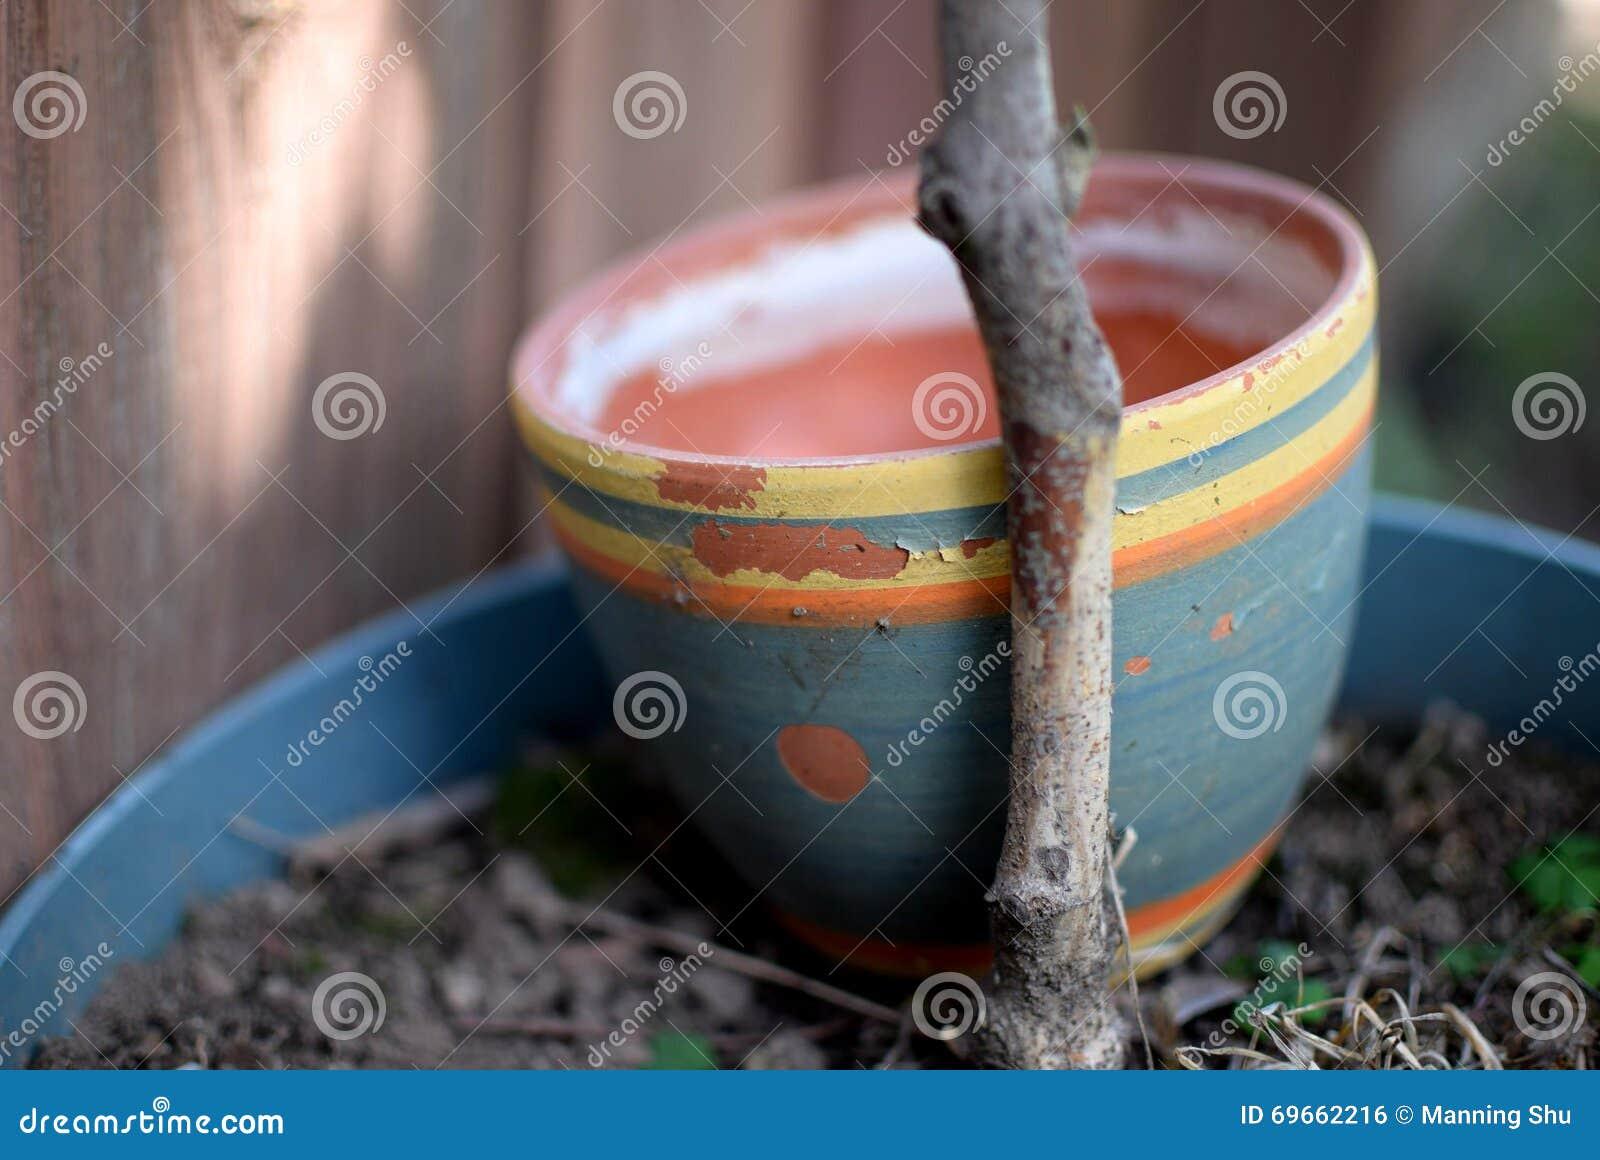 Terra Cotta Flower Pot pintada resistida